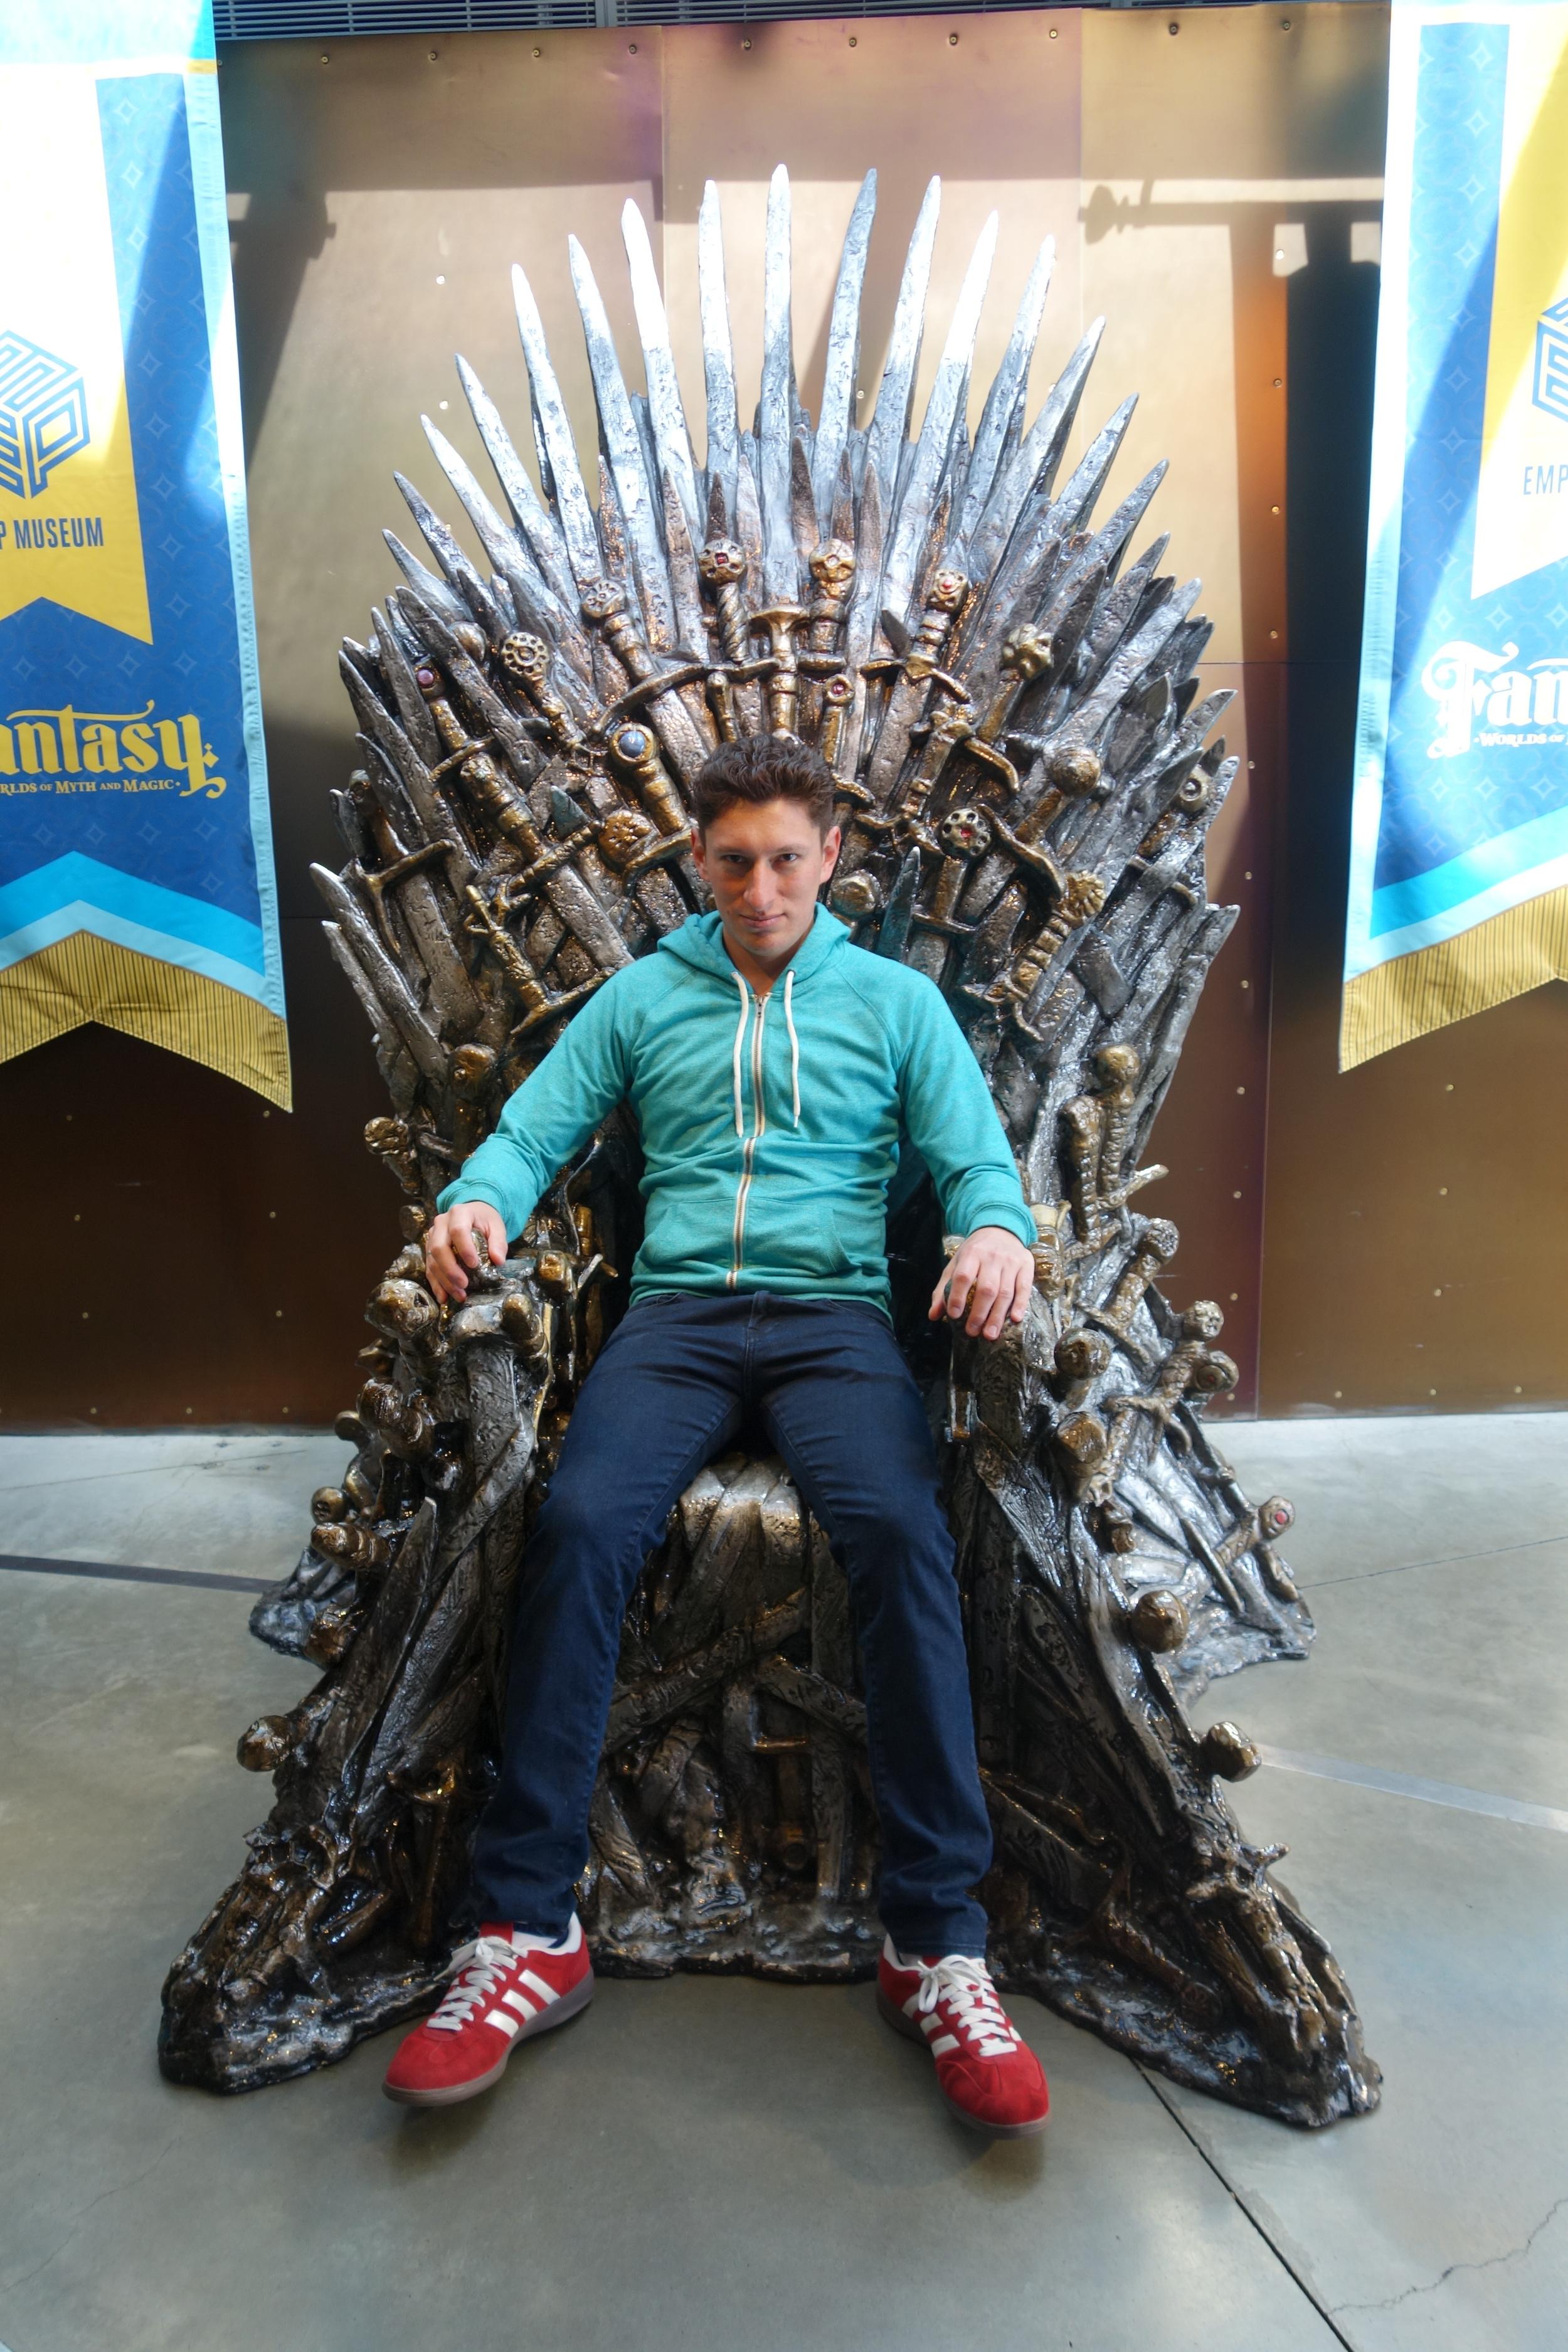 DSC00878 Richard on the Throne.JPG